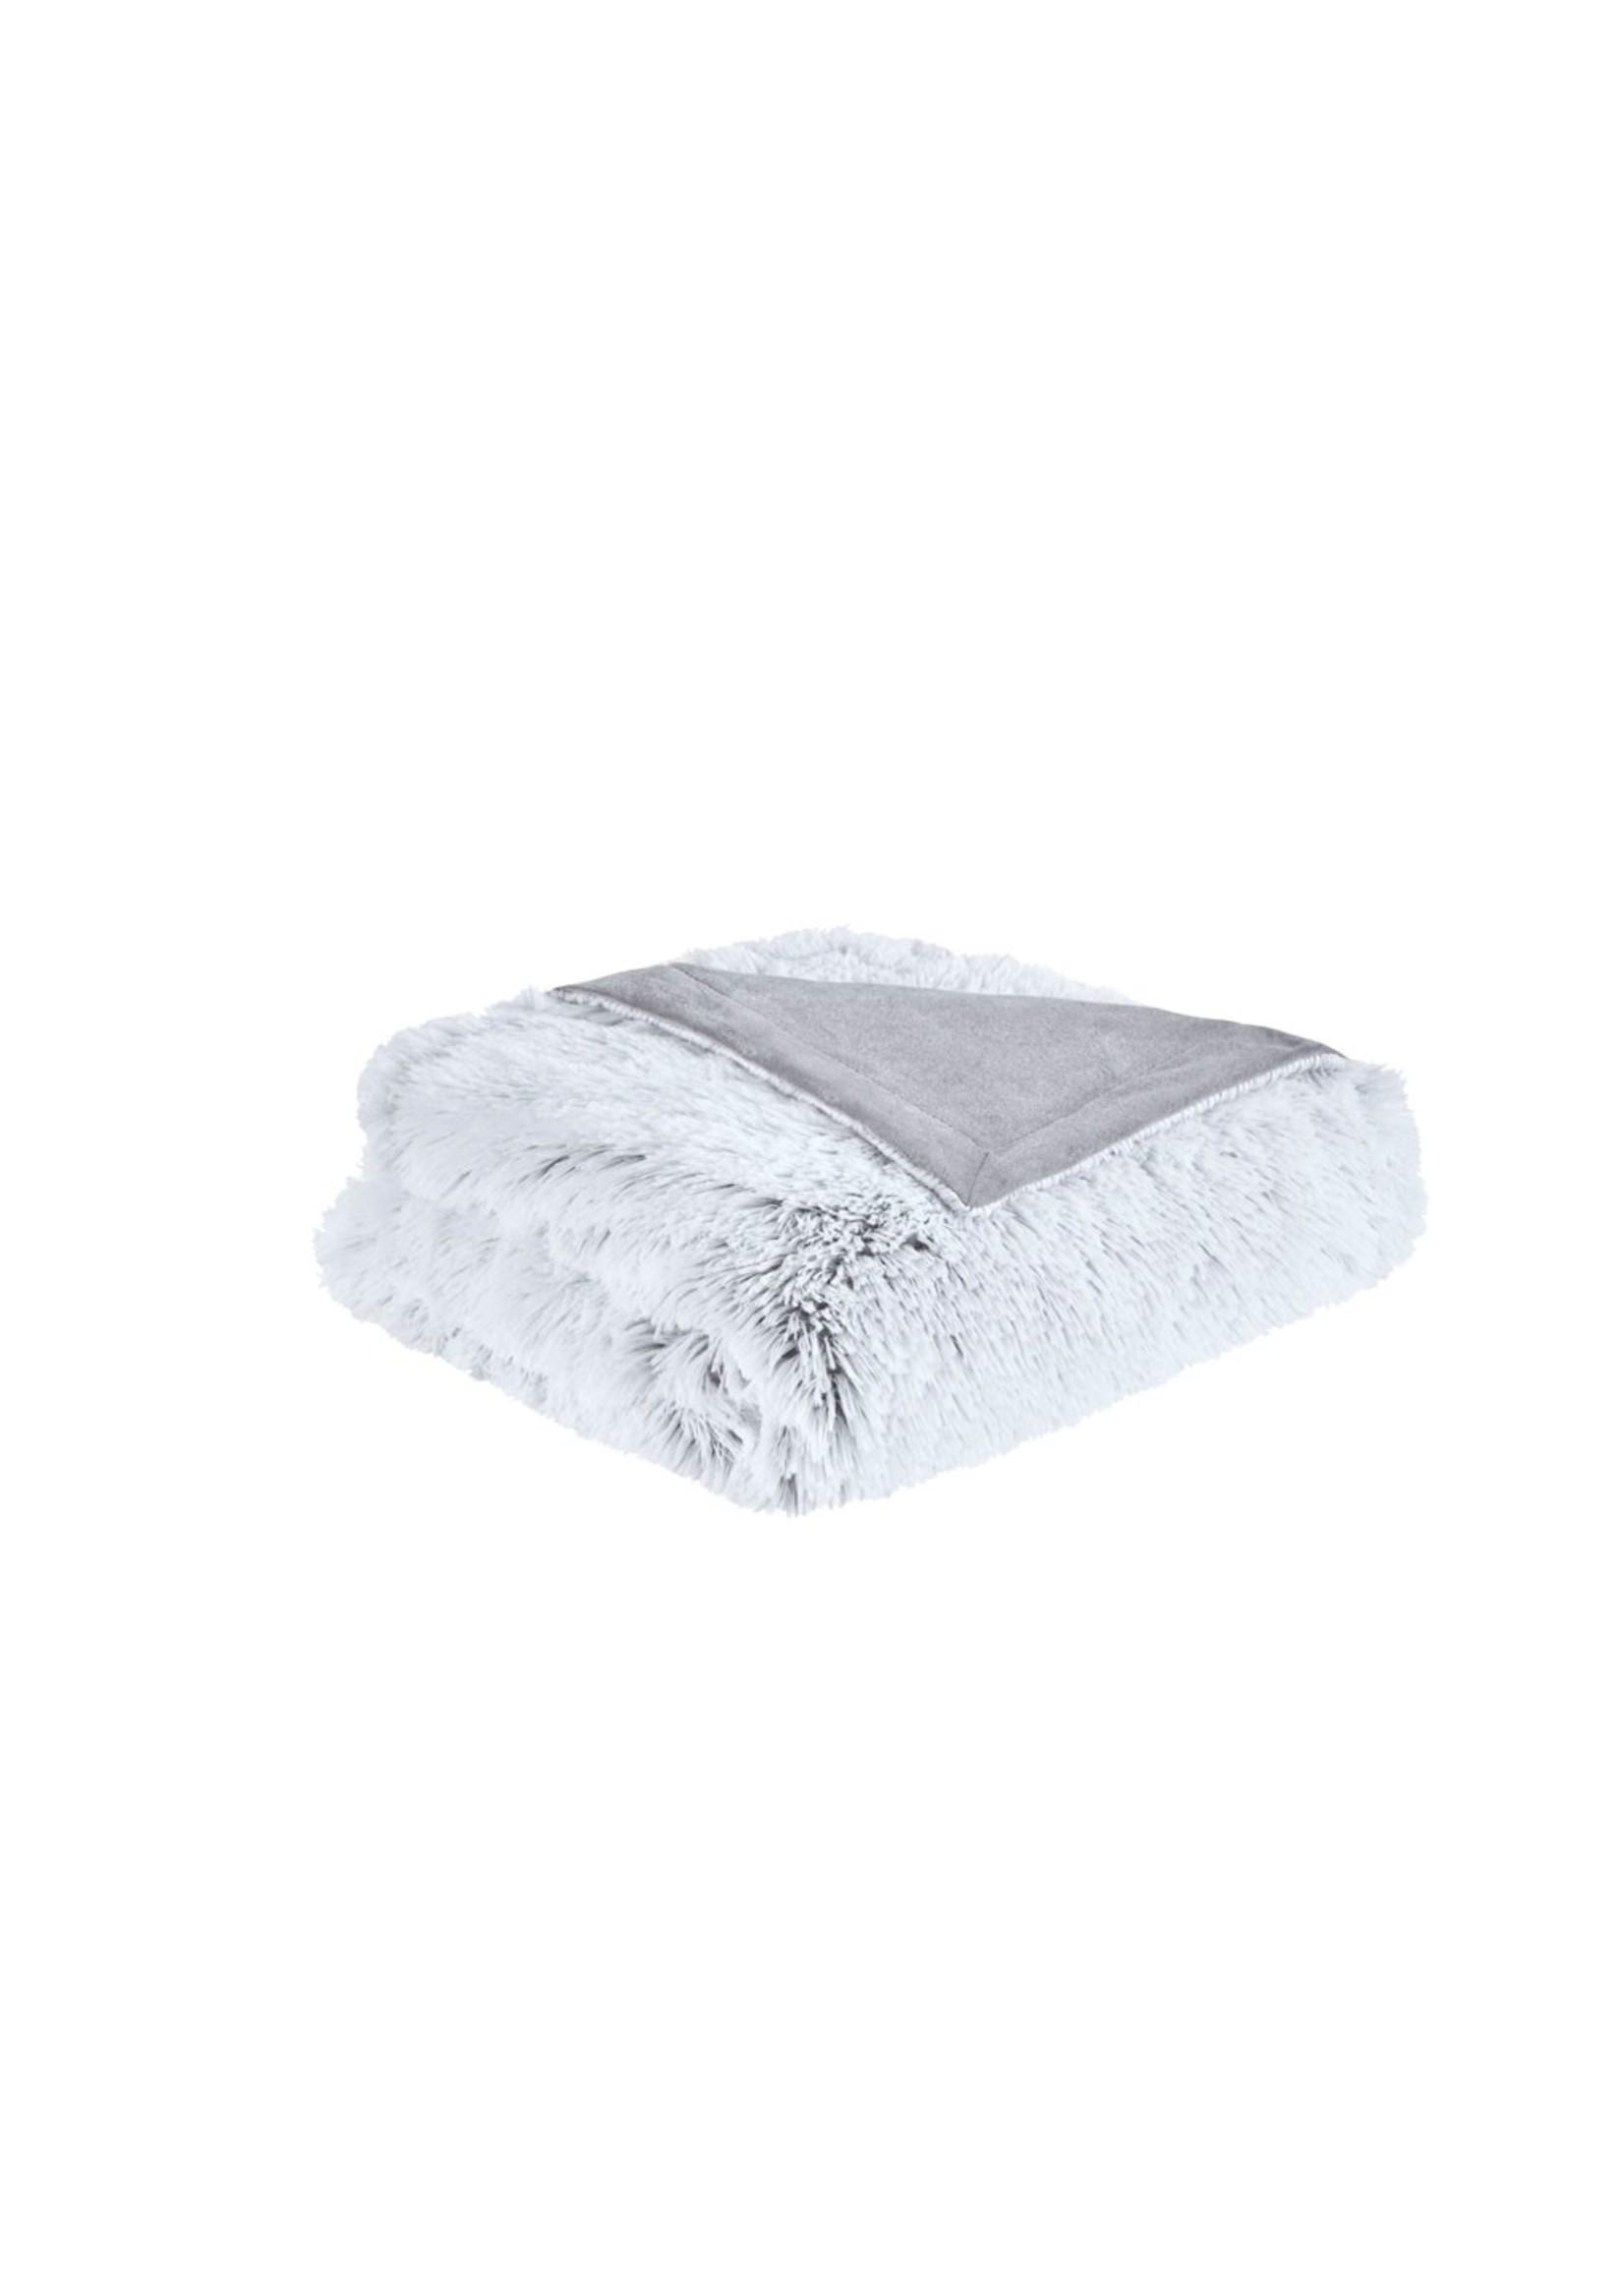 Olliix Shaggy Faux Fur Throw Grey